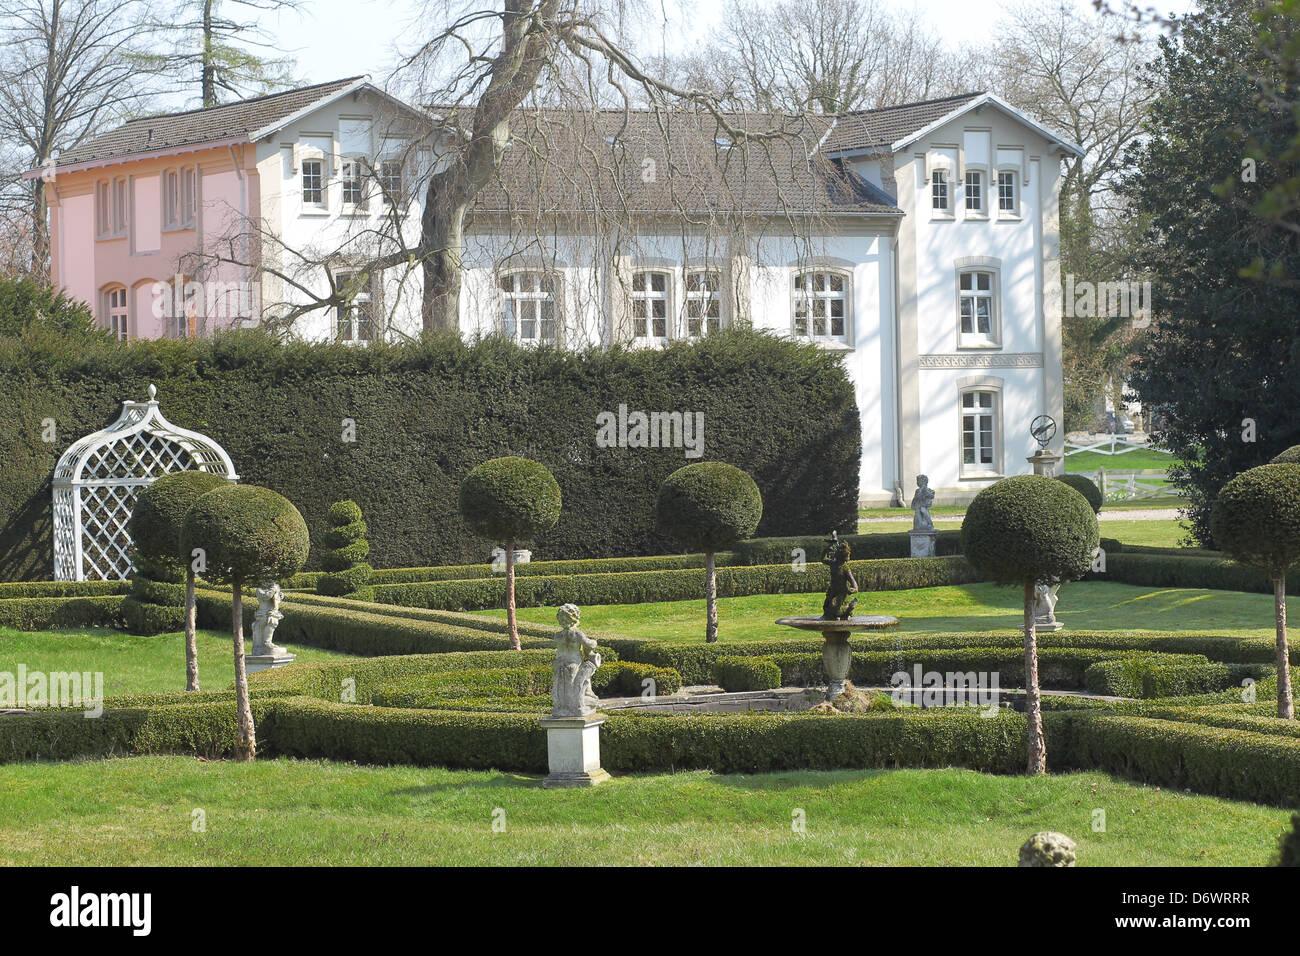 Panker, Germany, Kavaliershaus on Panker Stock Photo